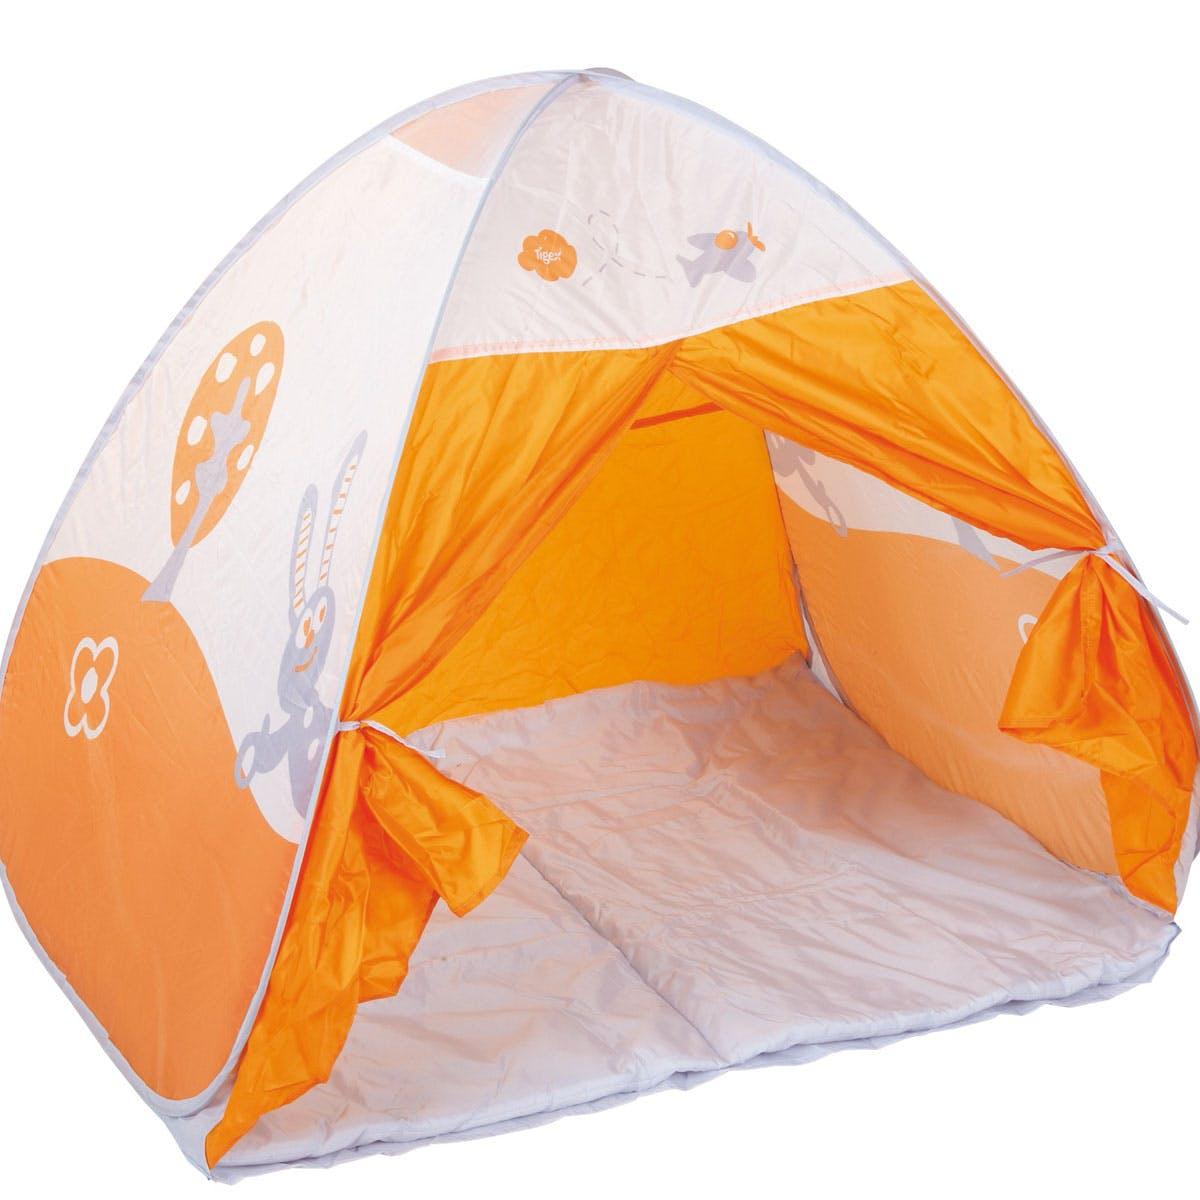 Tente anti-uv pop-up de Tigex : grande taille